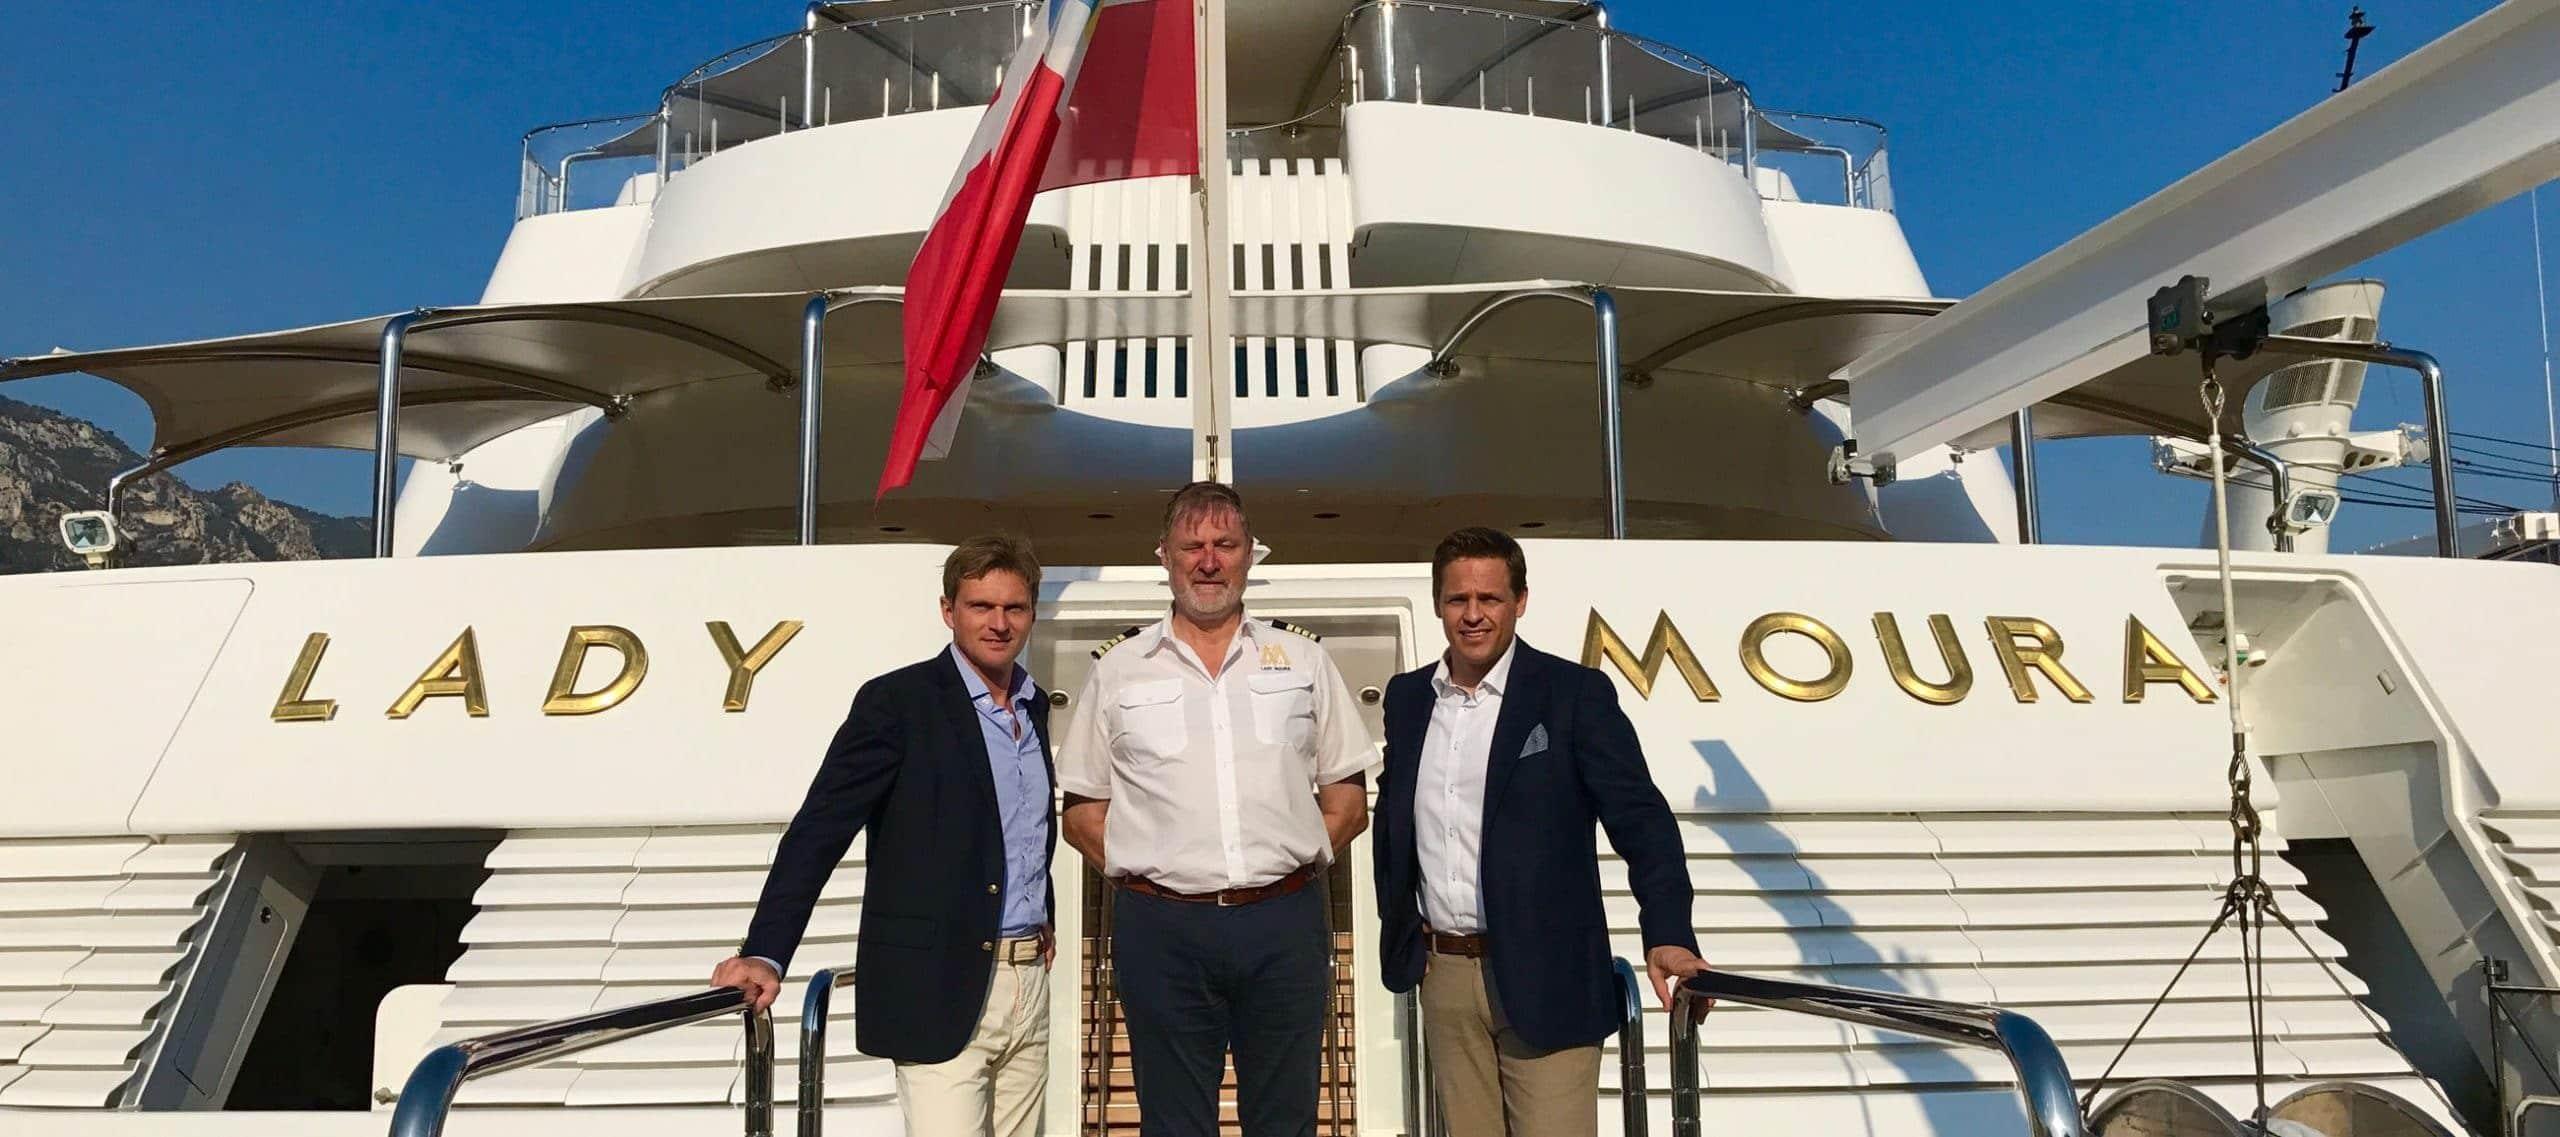 OceanEvent Dreharbeiten auf Luxusyacht Lady Moura